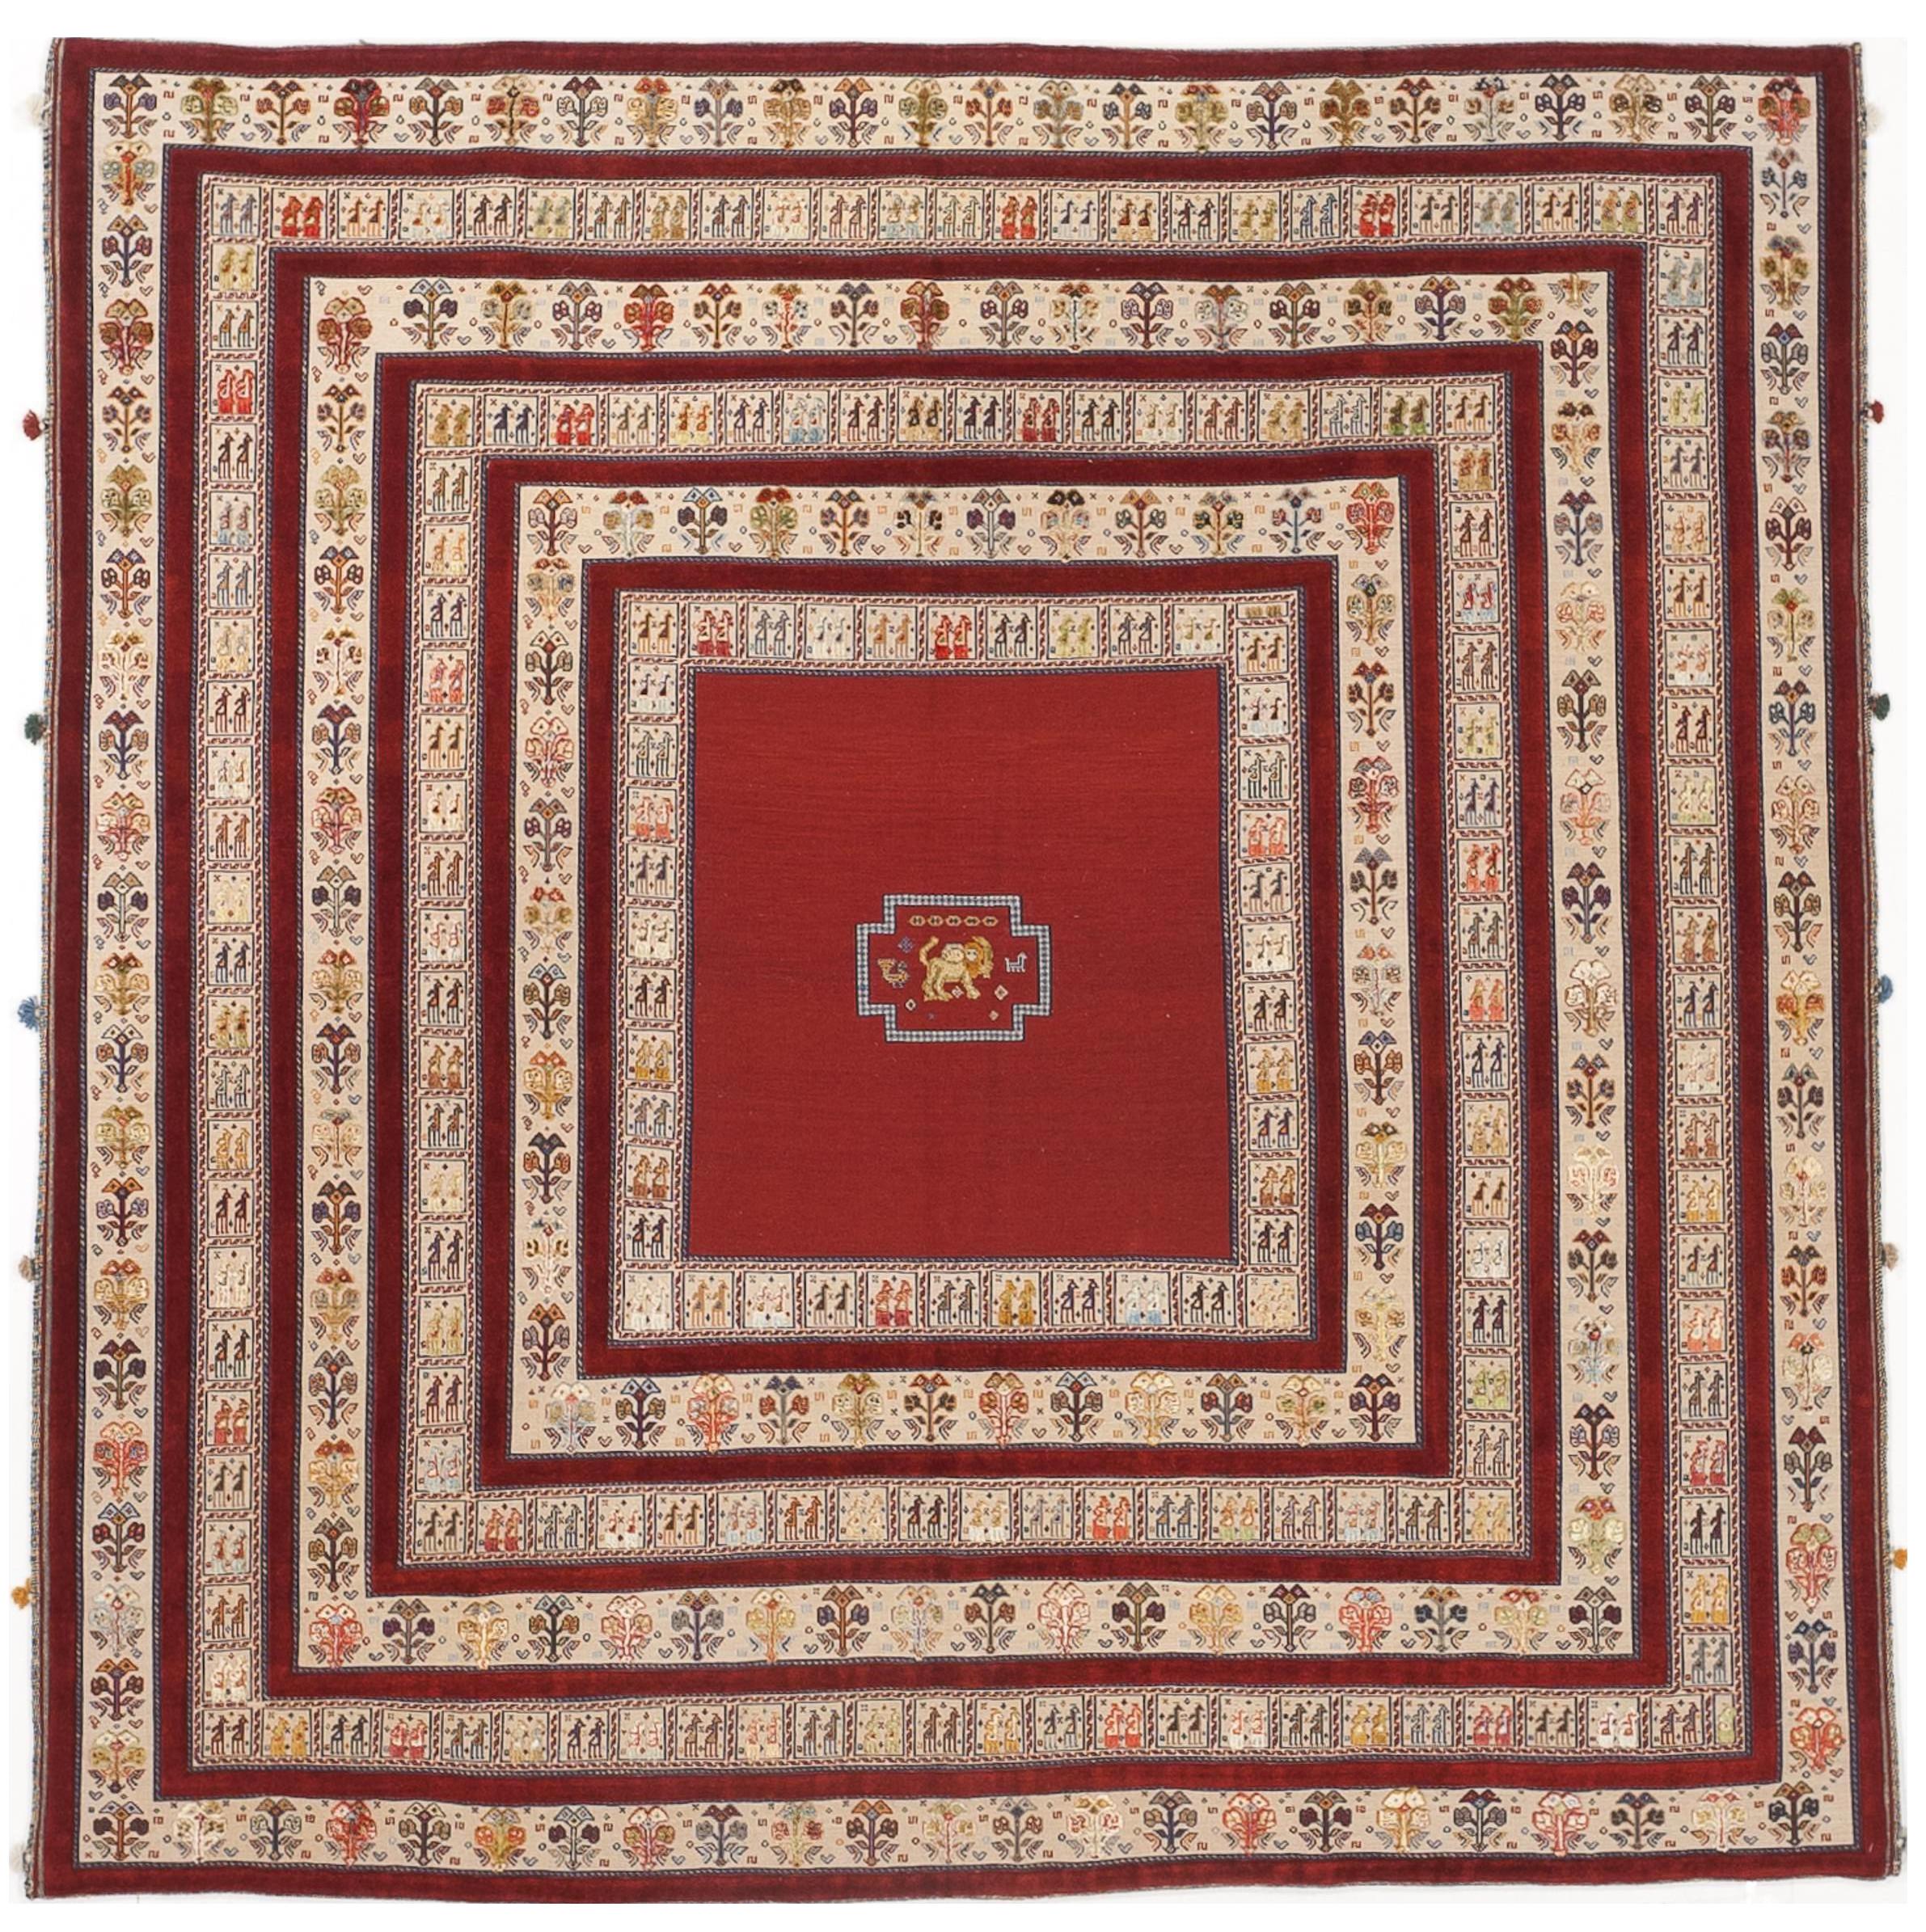 Handmade Persian Nomadic Woven Wool Silk Art Rug 6 X